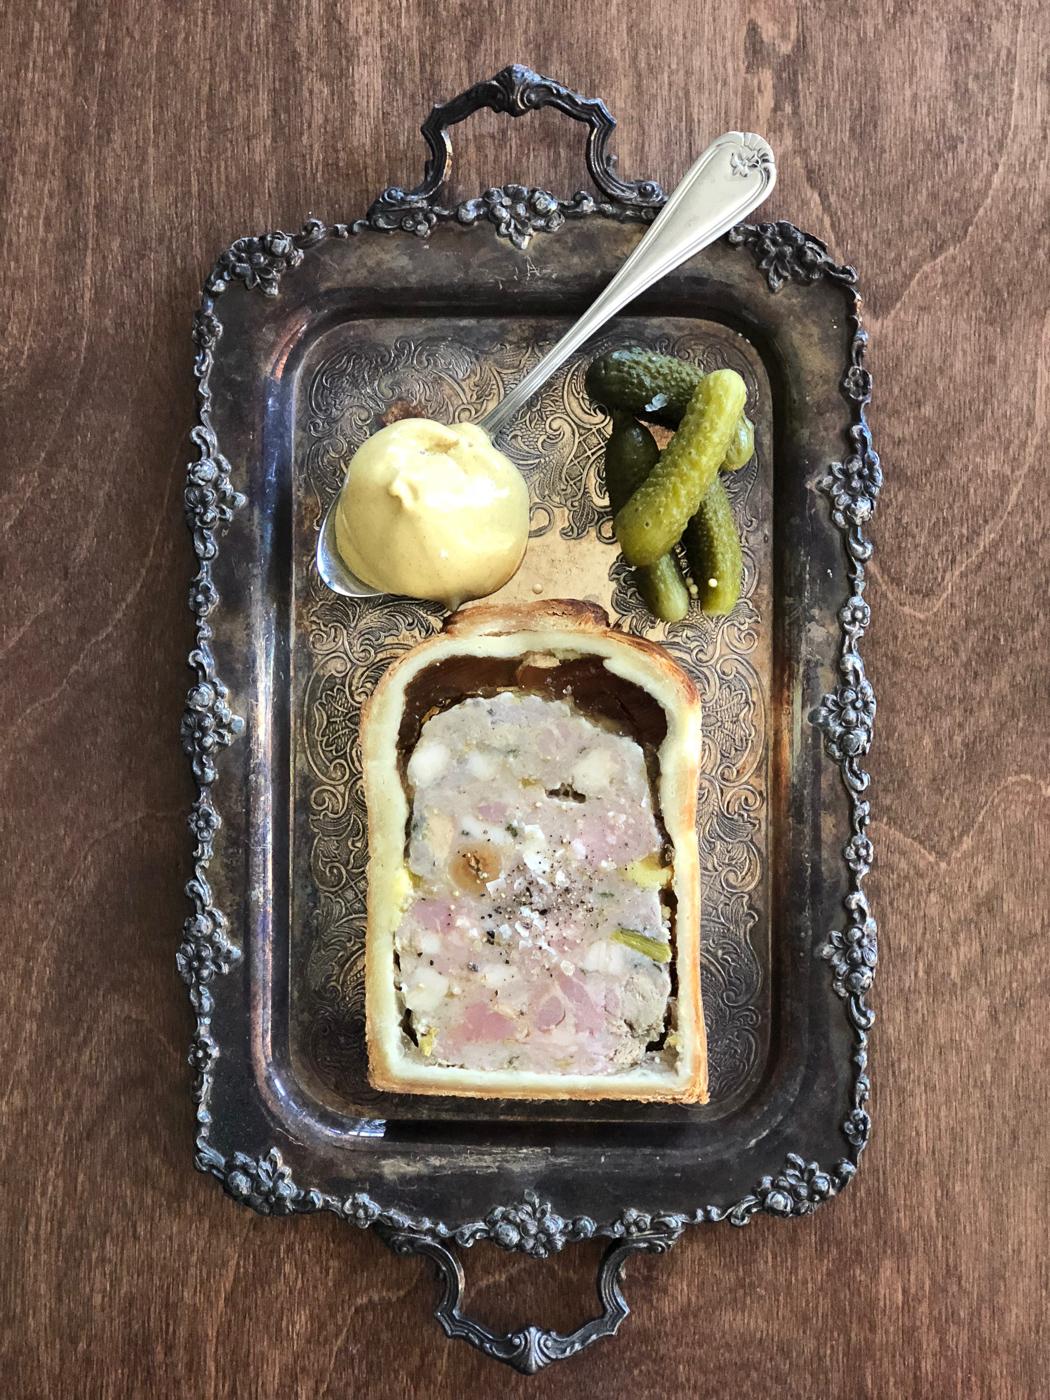 tooktook-photography-gastronomy-food-beverages-experiences-restaurants-105.jpg